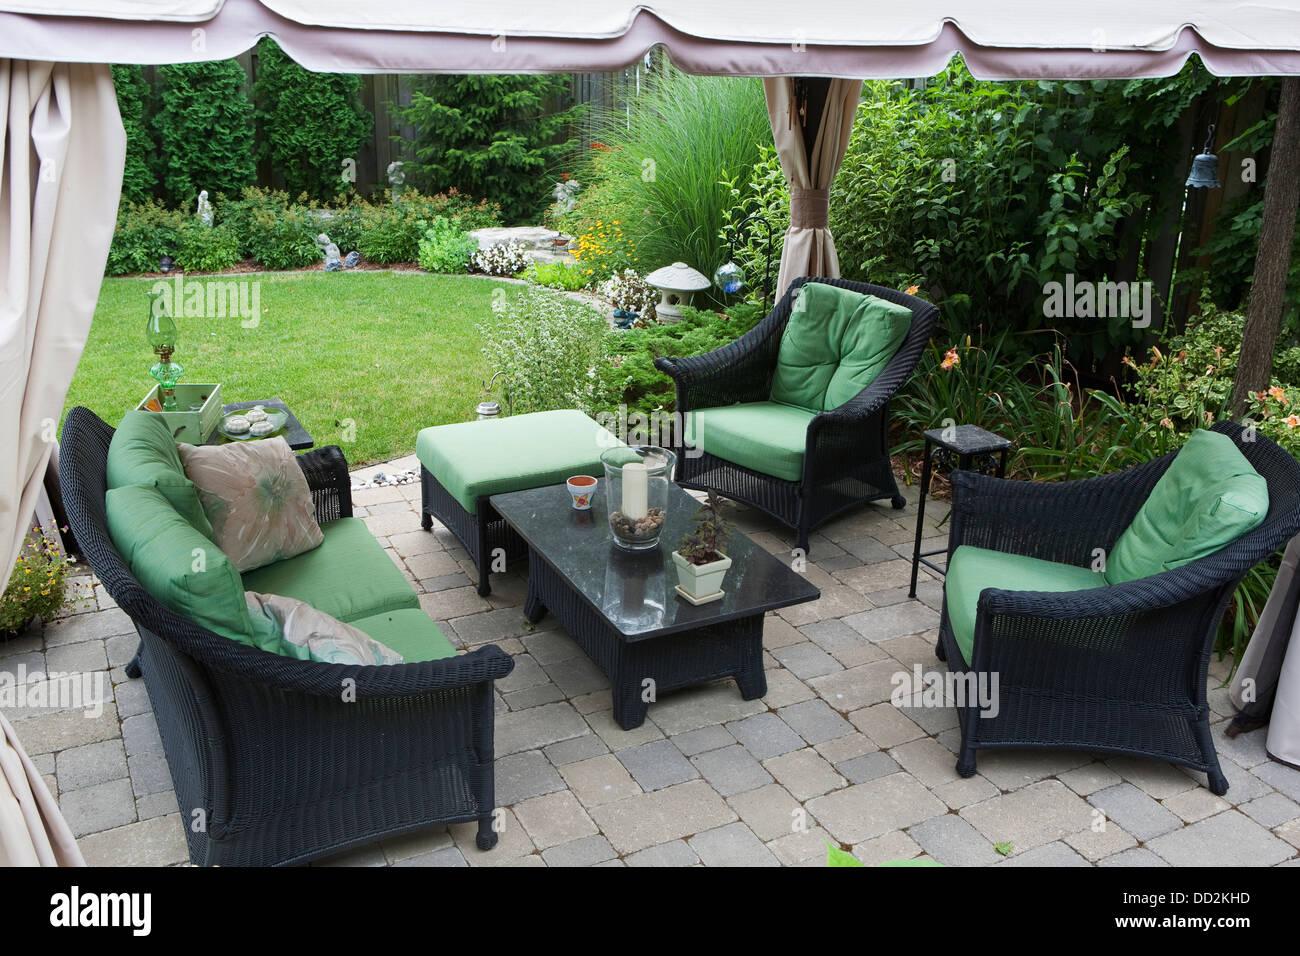 Covered Patio Furniture On Stone Patio In A Backyard Burlington Stock Photo Alamy